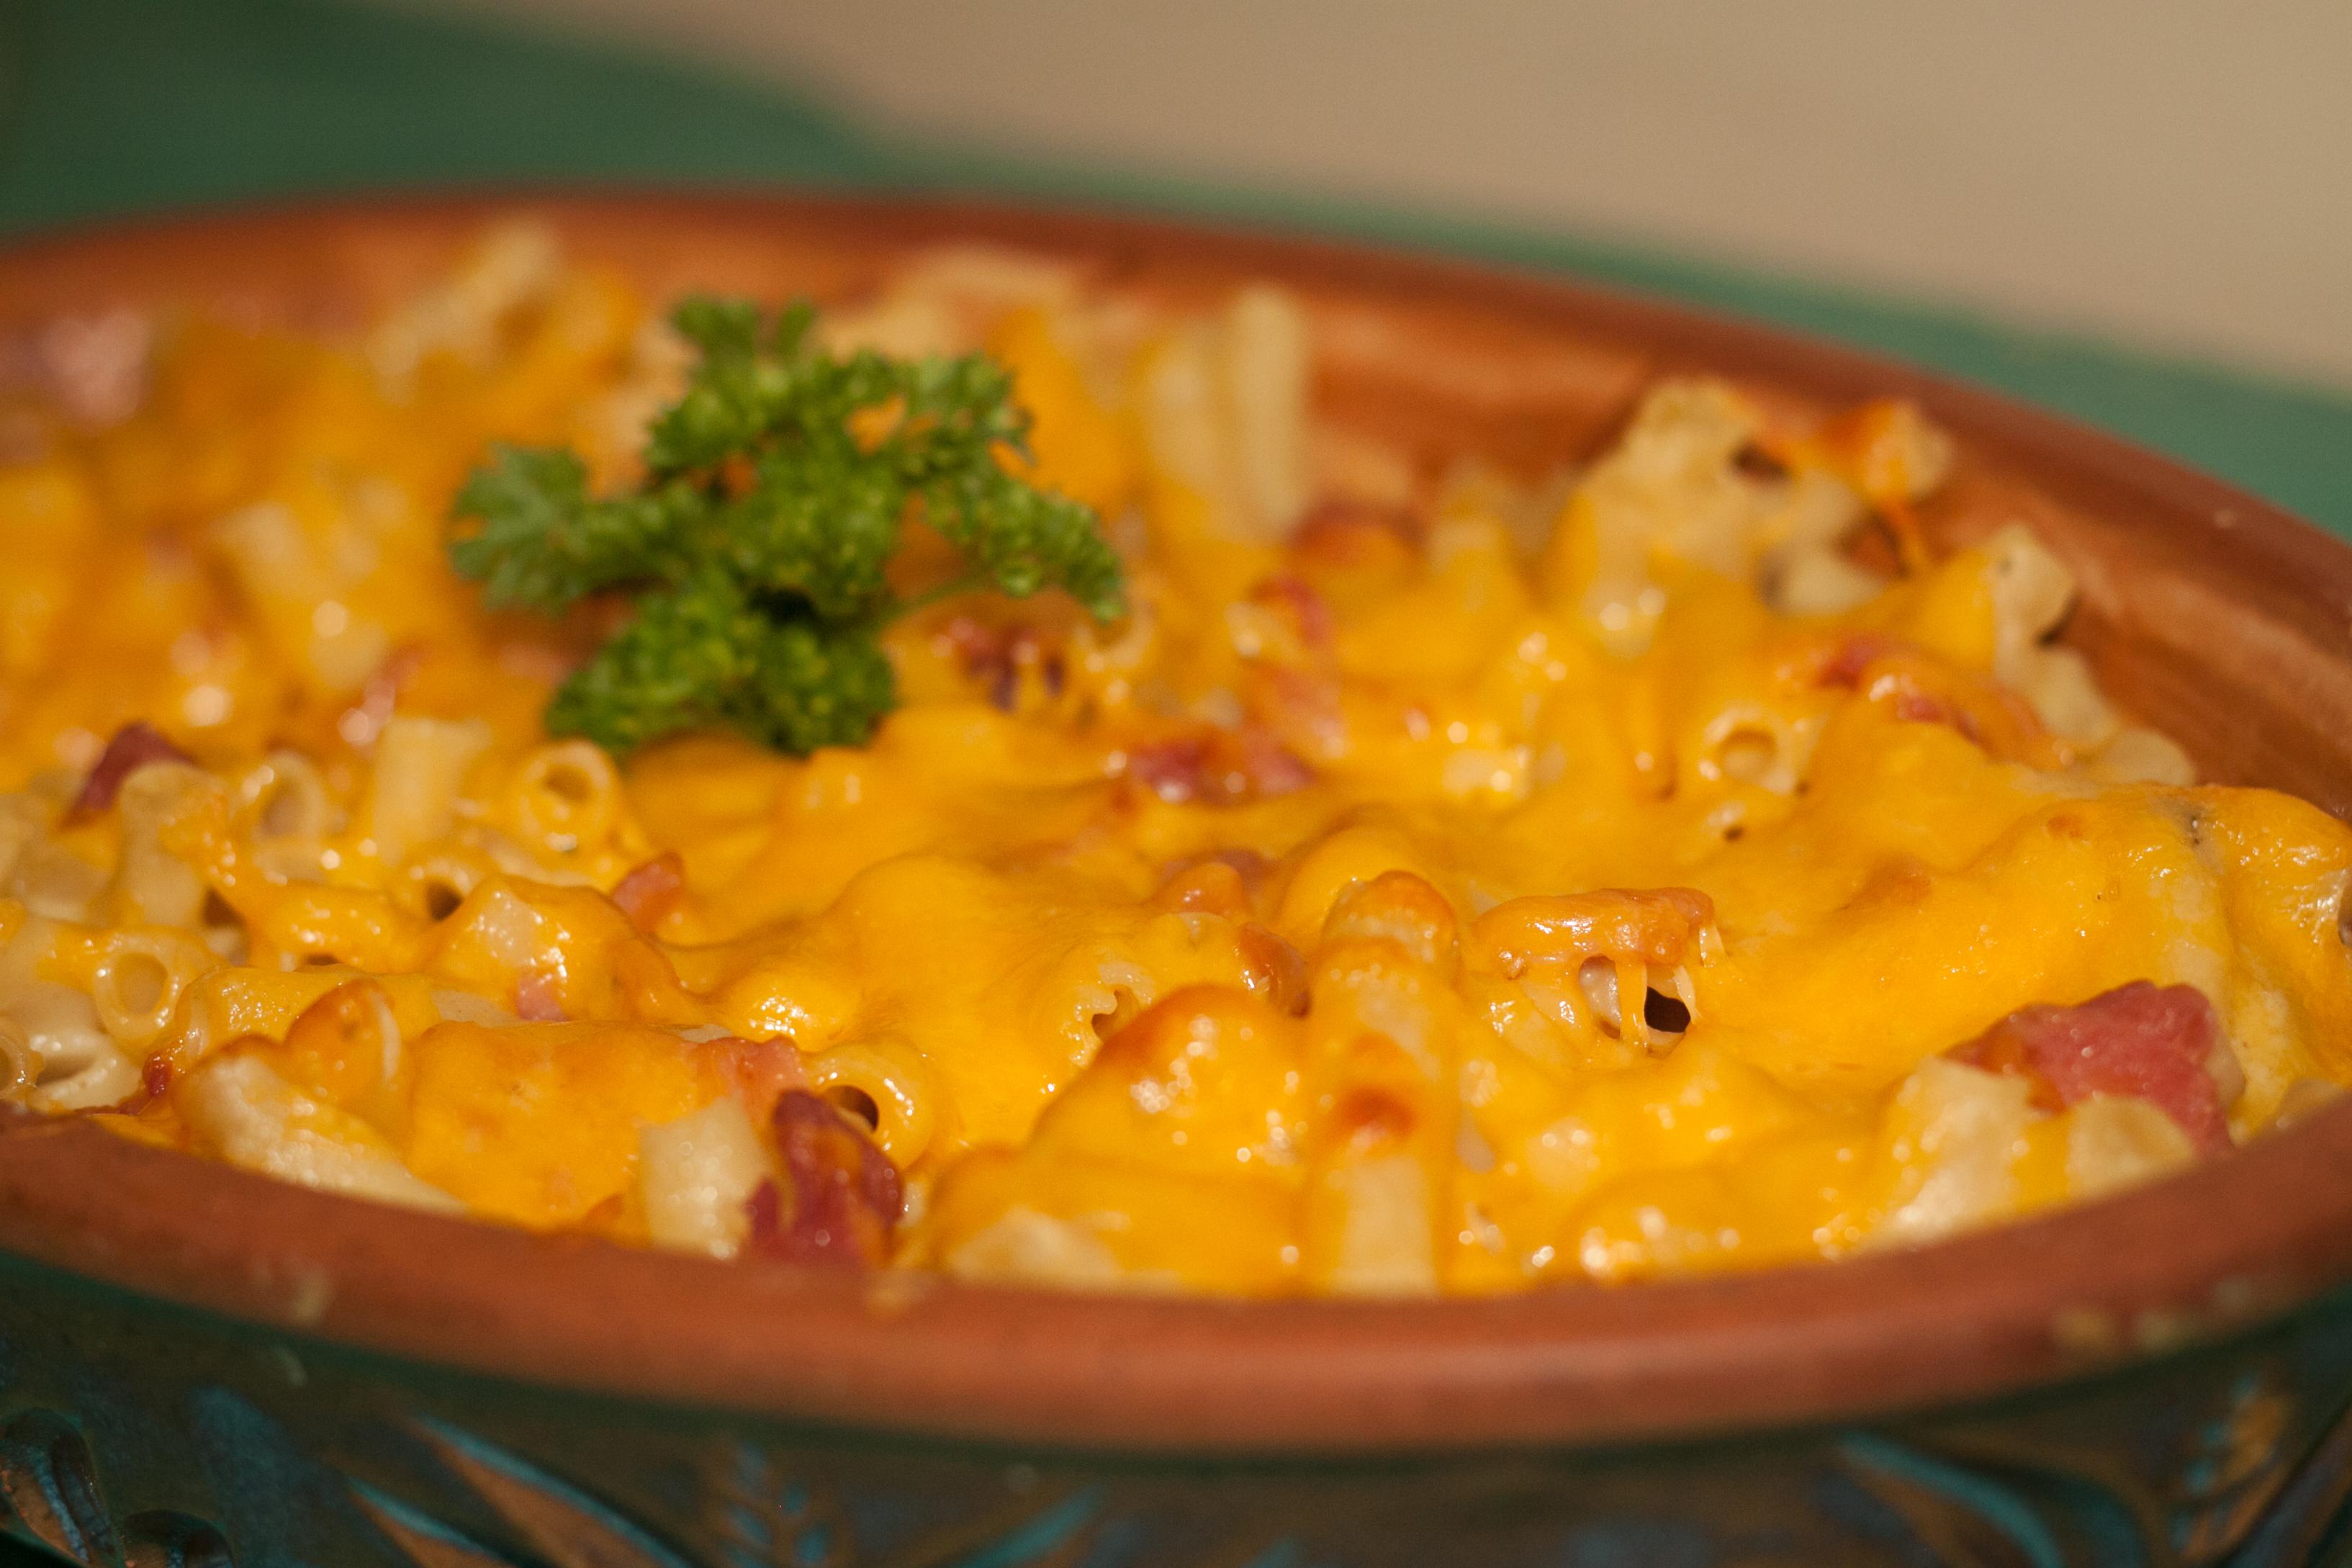 GASTROTURF: The Big Mac & Cheese Edition